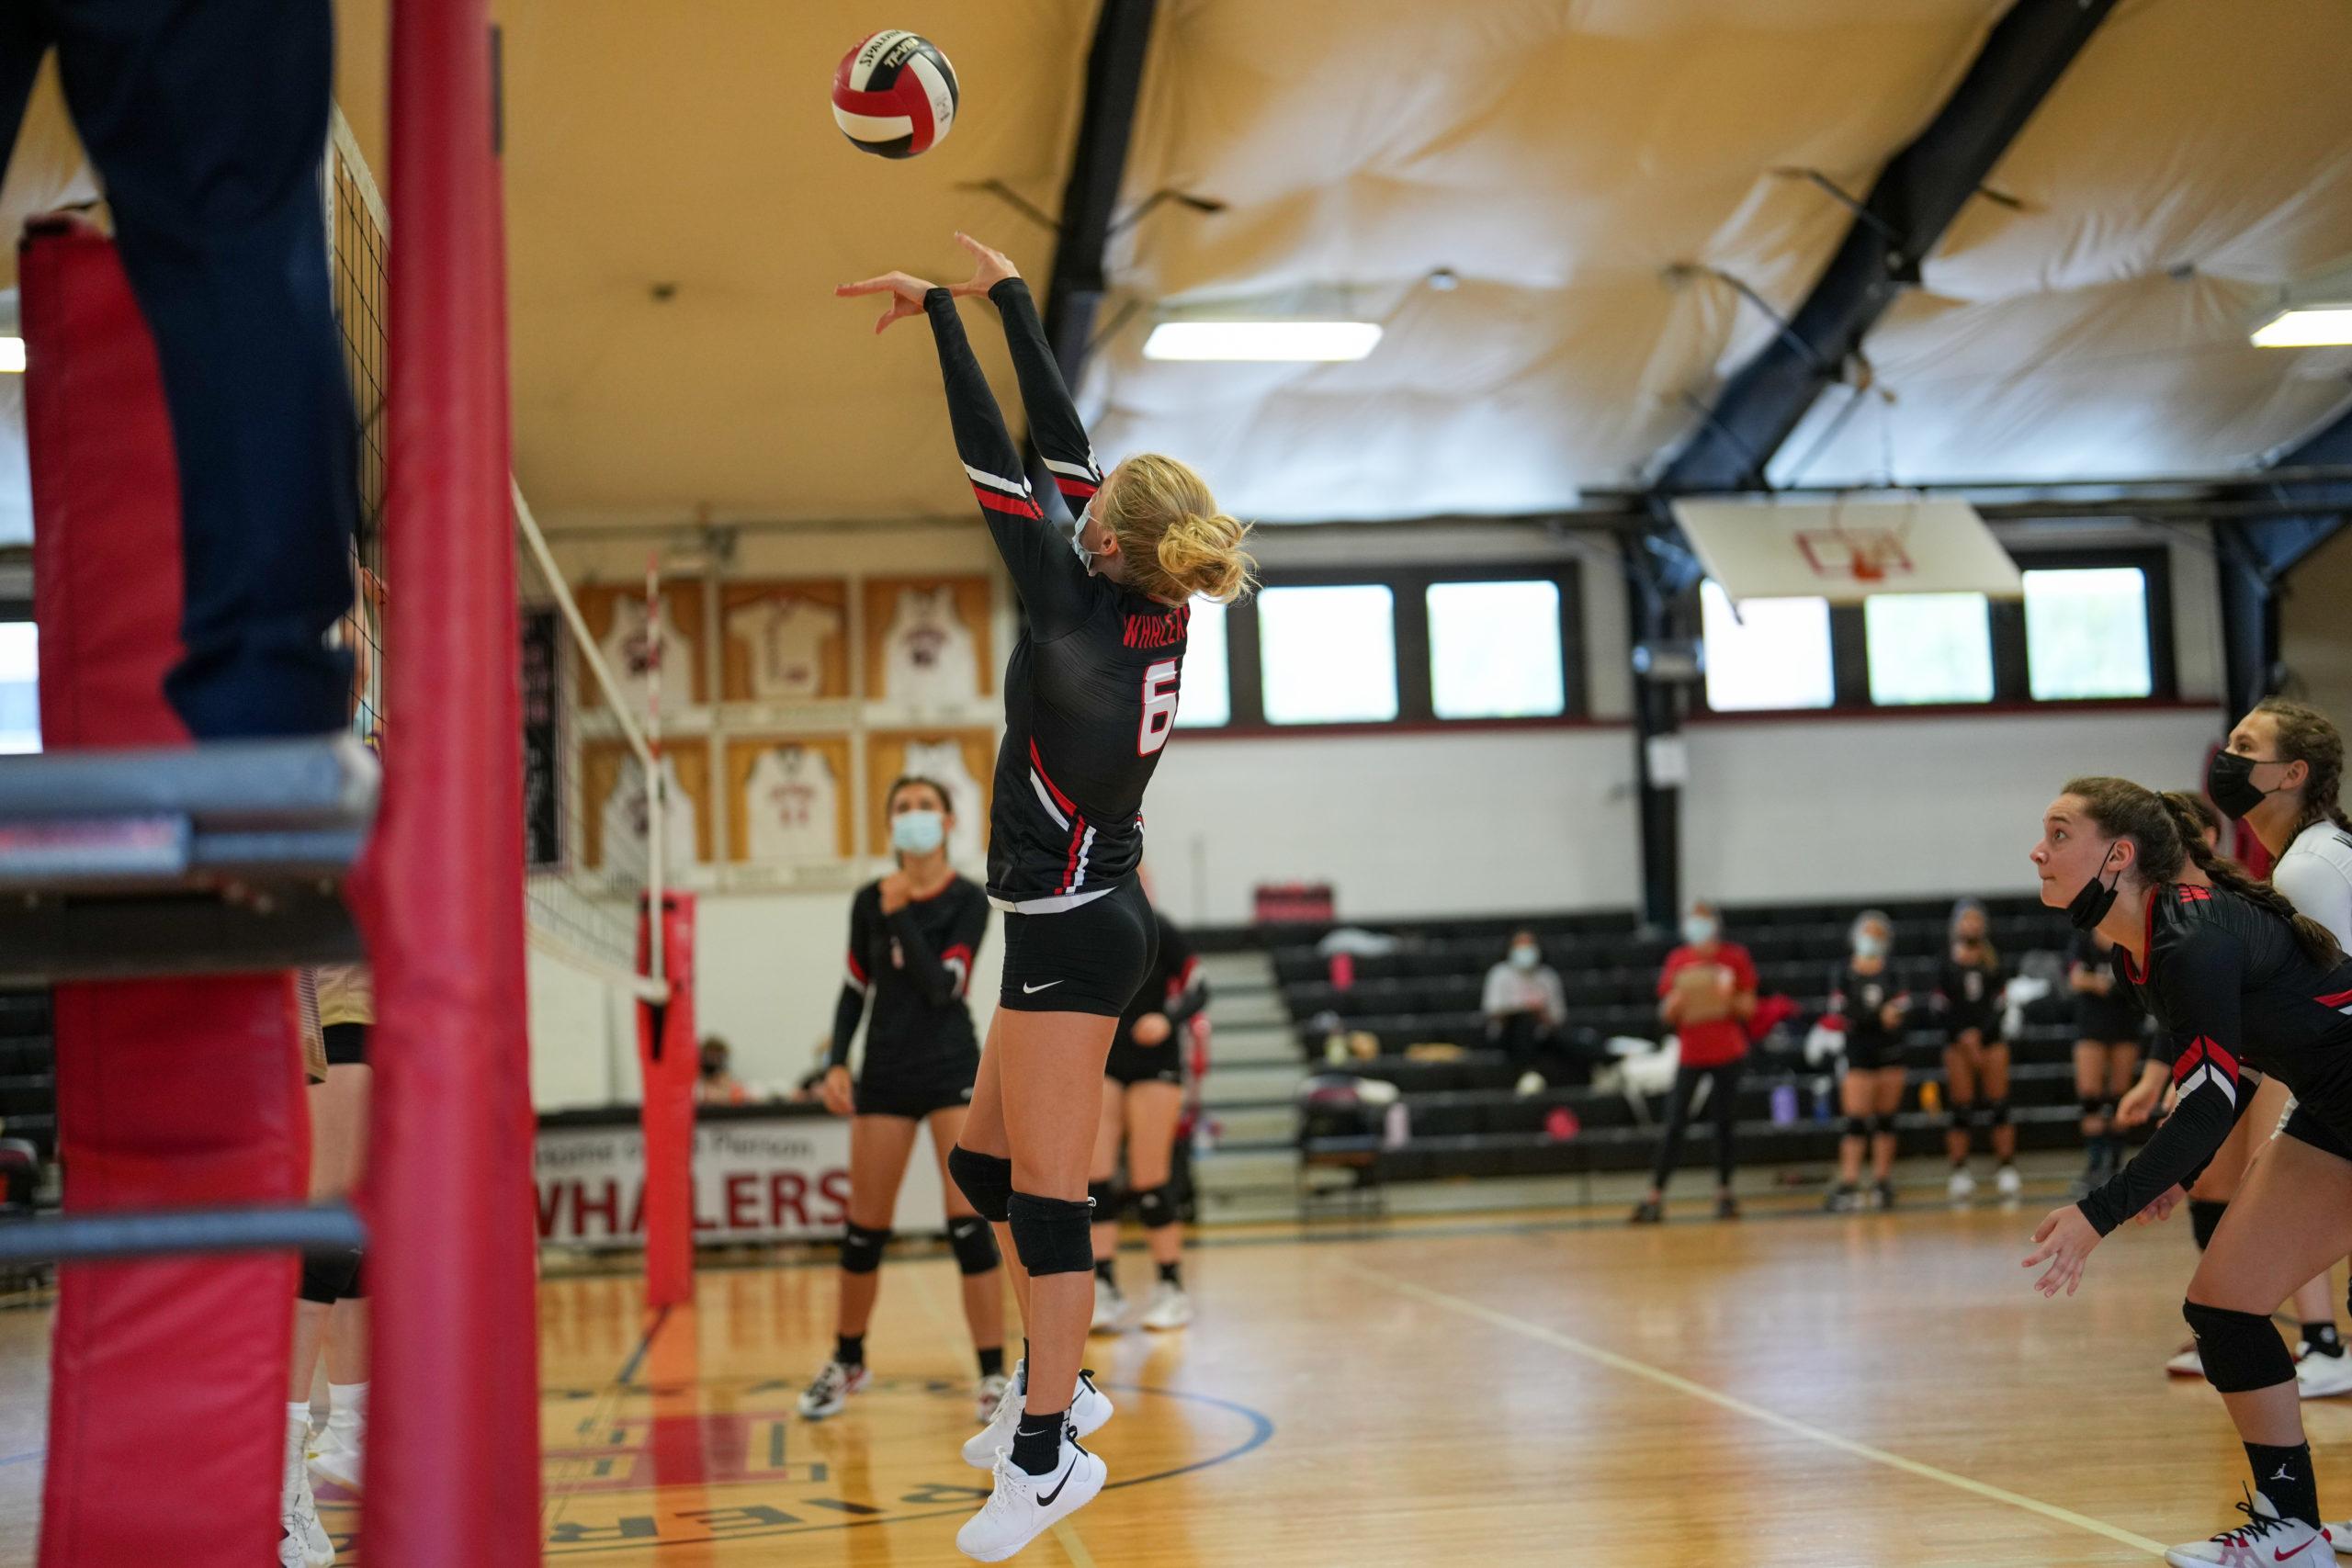 Pierson junior Sadie Latanzio pushes the ball back over the net.